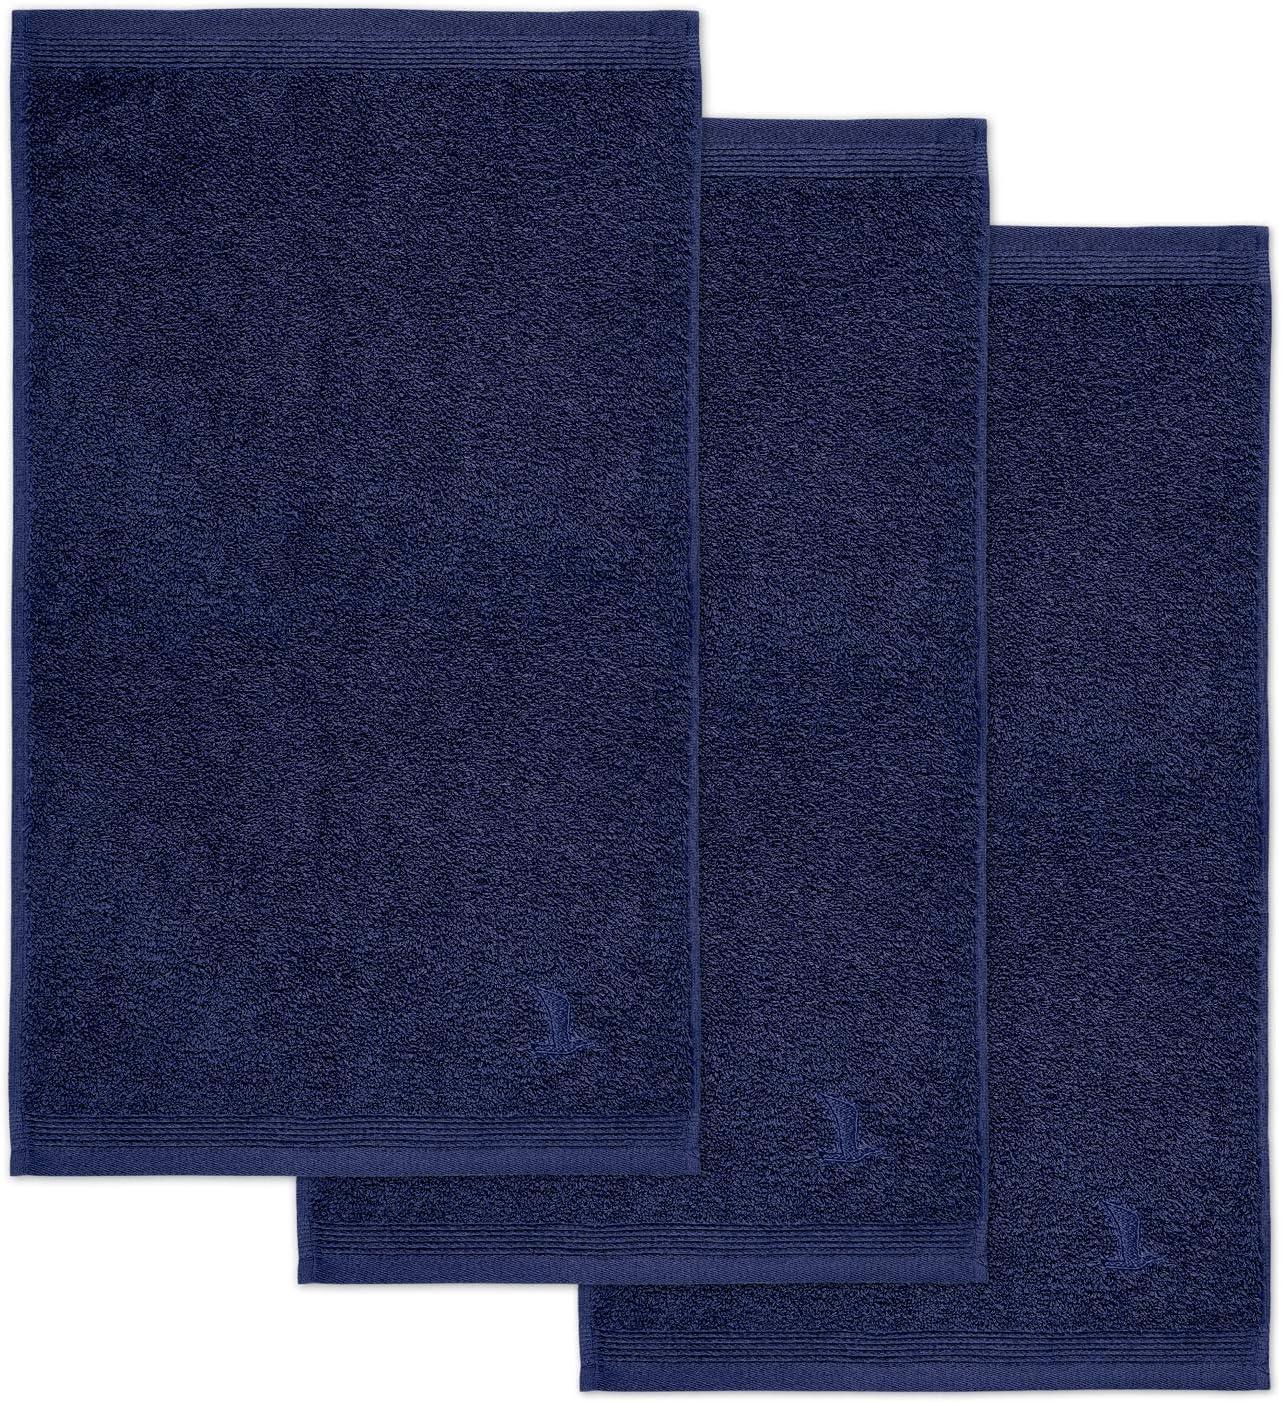 peridot 3er Set m/öve Superwuschel Seiftuch 30 x 30 cm aus 100/% Baumwolle